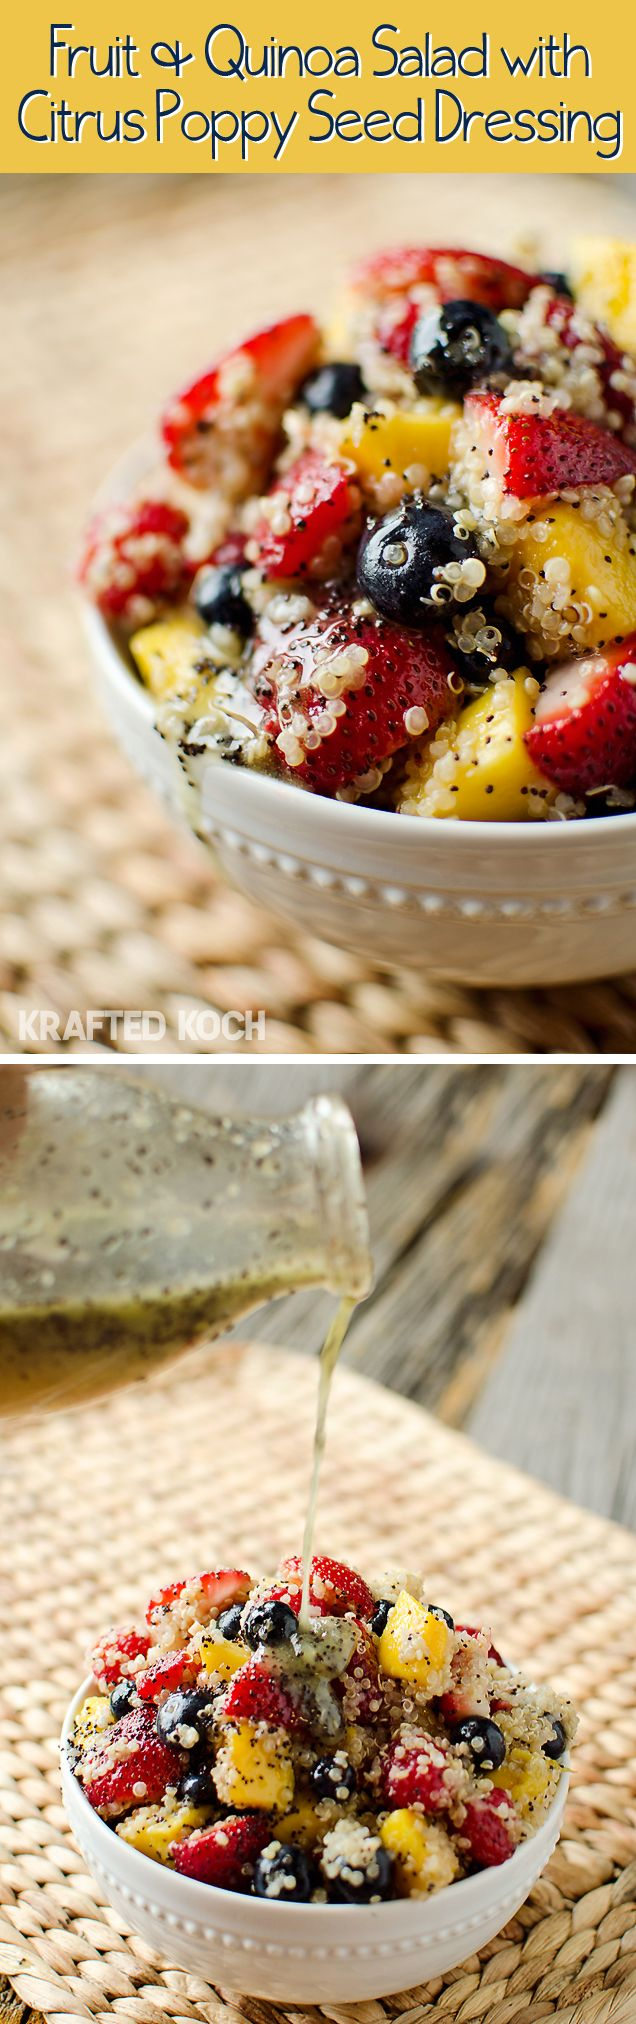 Fruit & Quinoa Salad with Citrus Poppy Seed Dressing